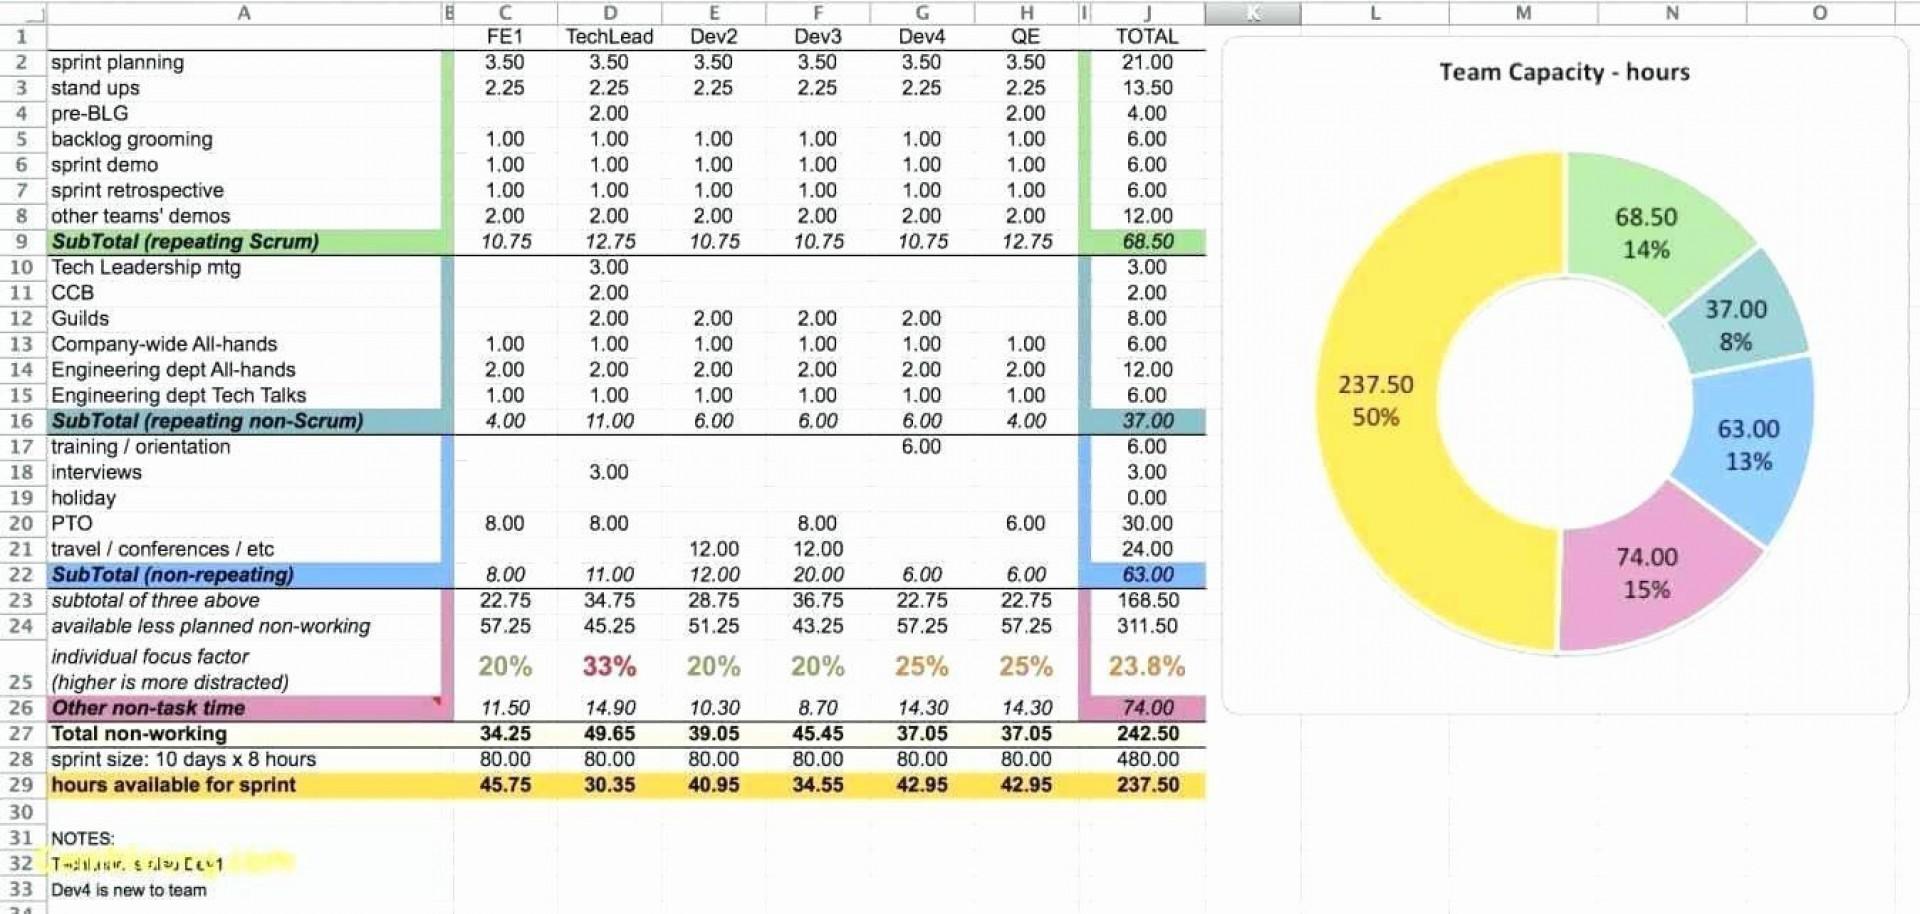 000 Excellent Project Management Template Free Download Inspiration  Excel Website1920